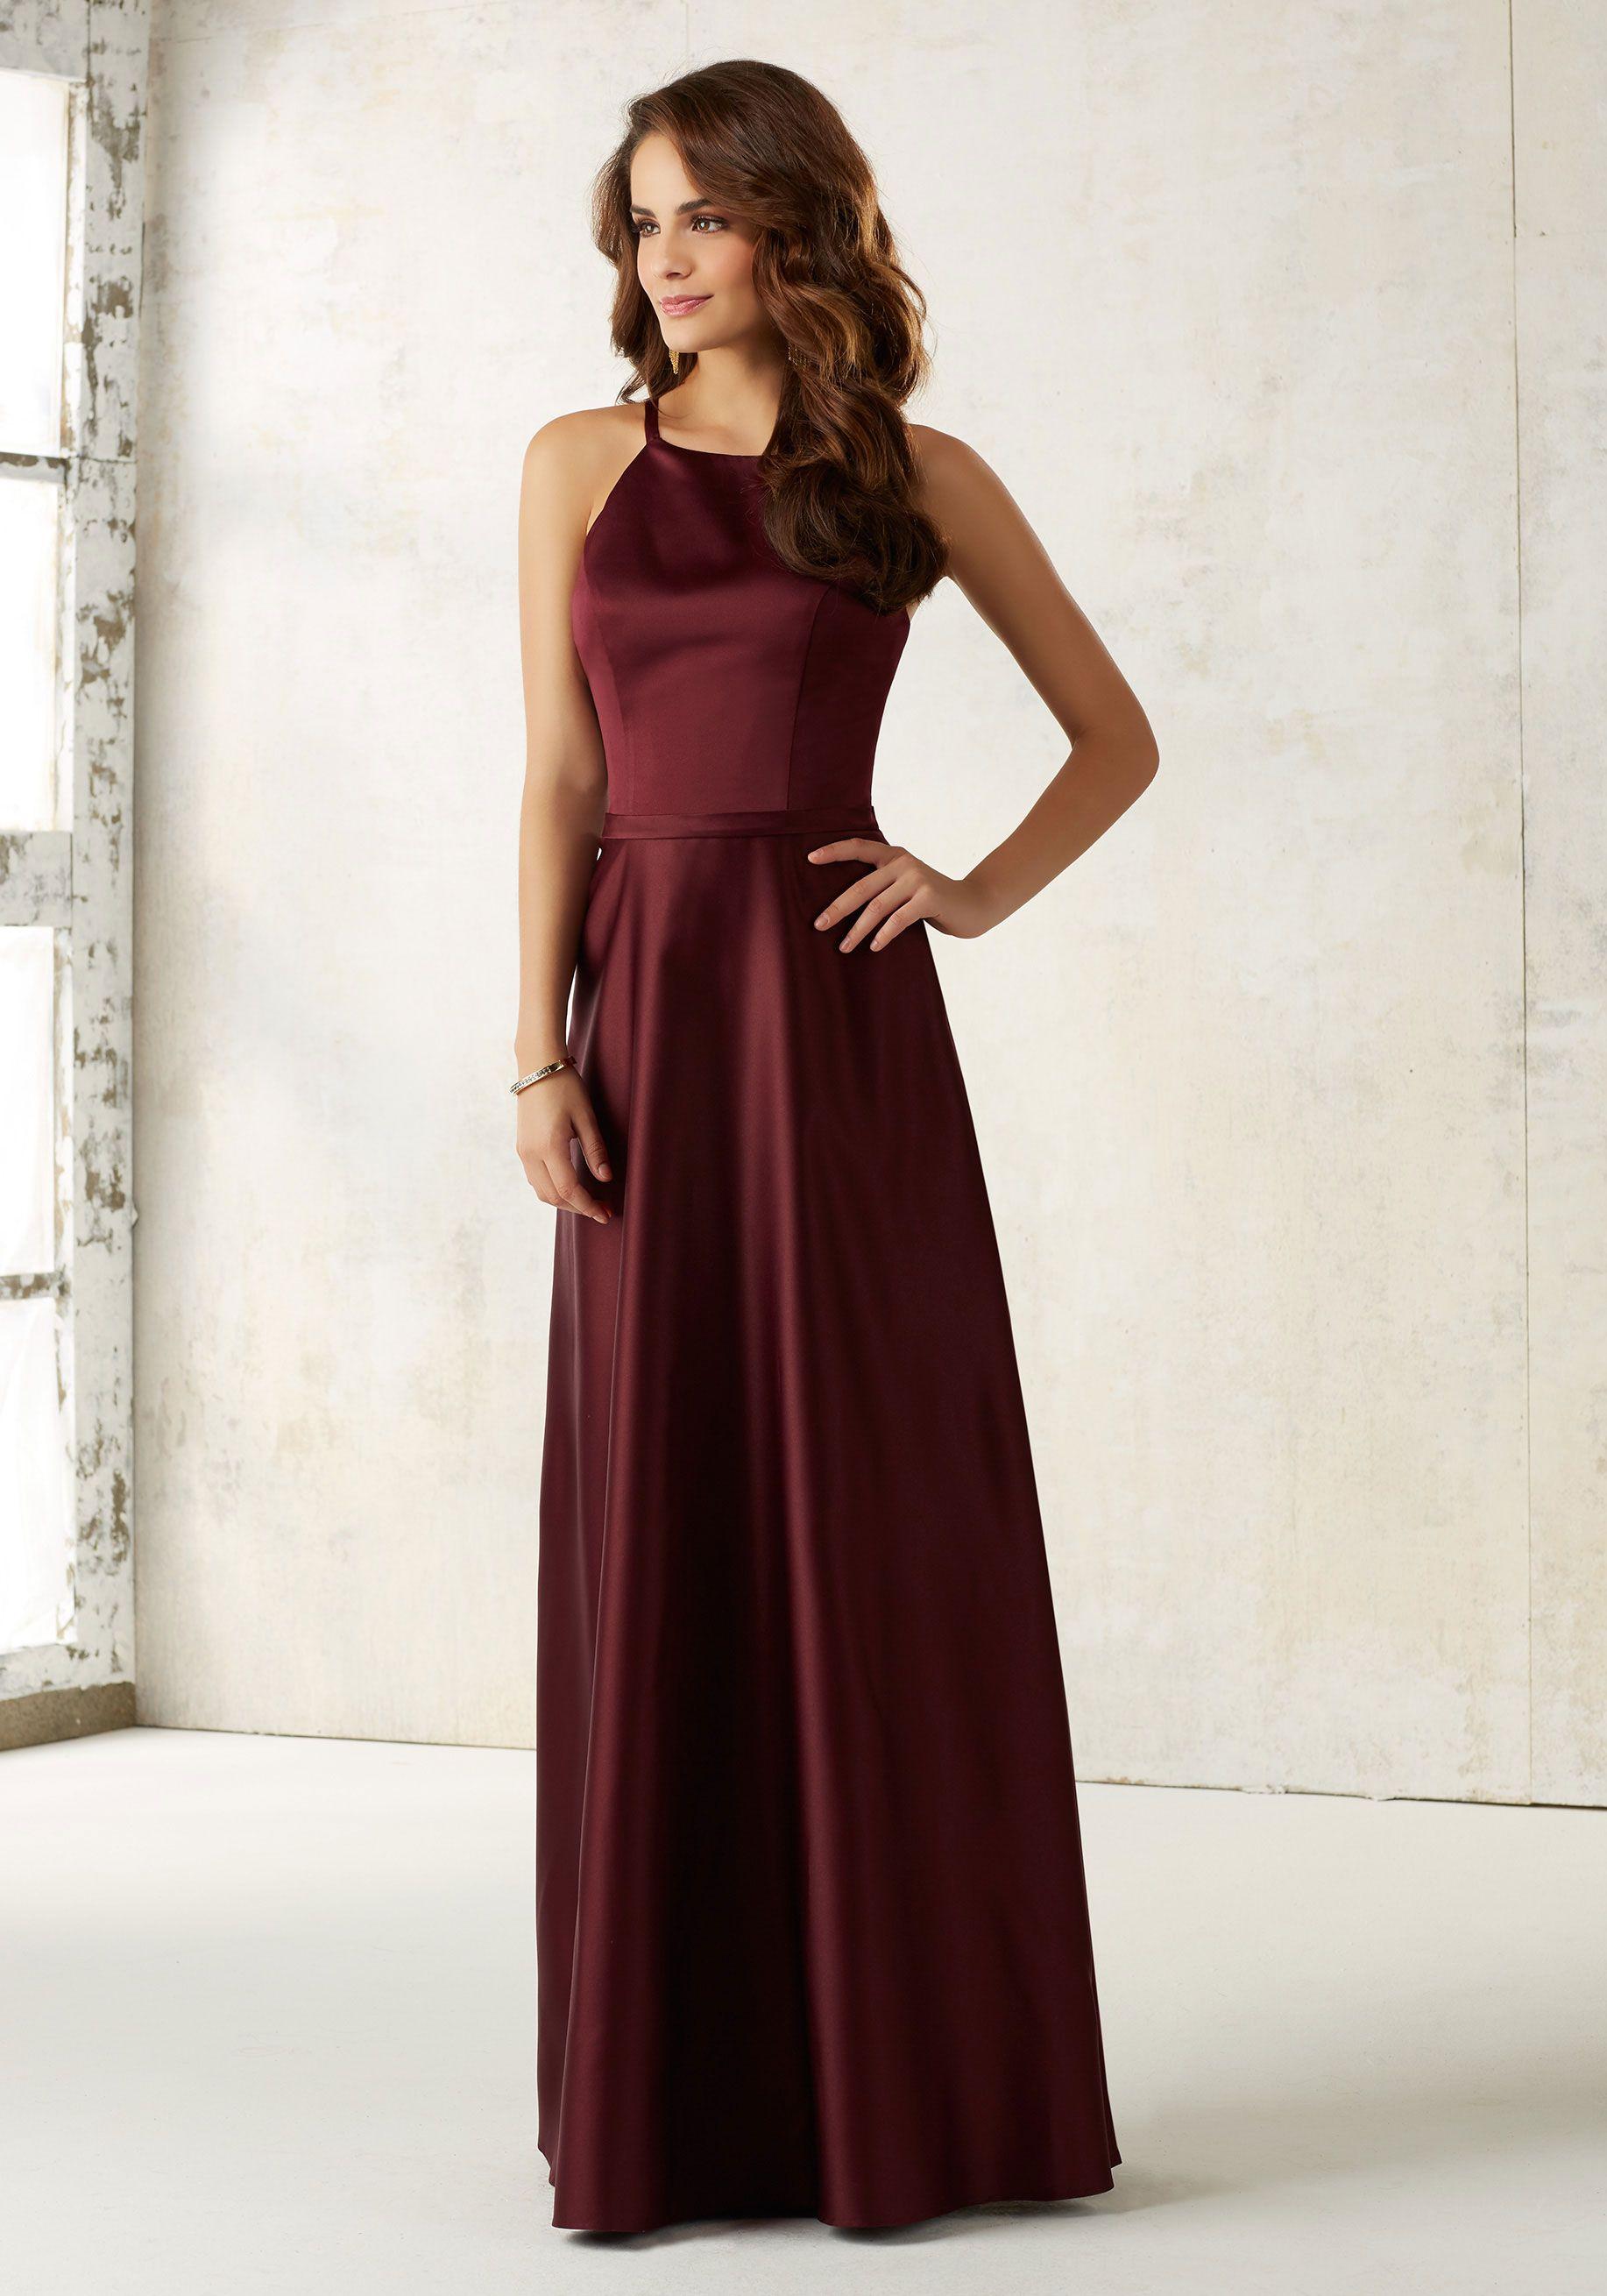 Morilee By Madeline Gardner Bridesmaids Style 21517 Sleek Satin Dress Features A Matching Waistband And Hidden Side Pockets